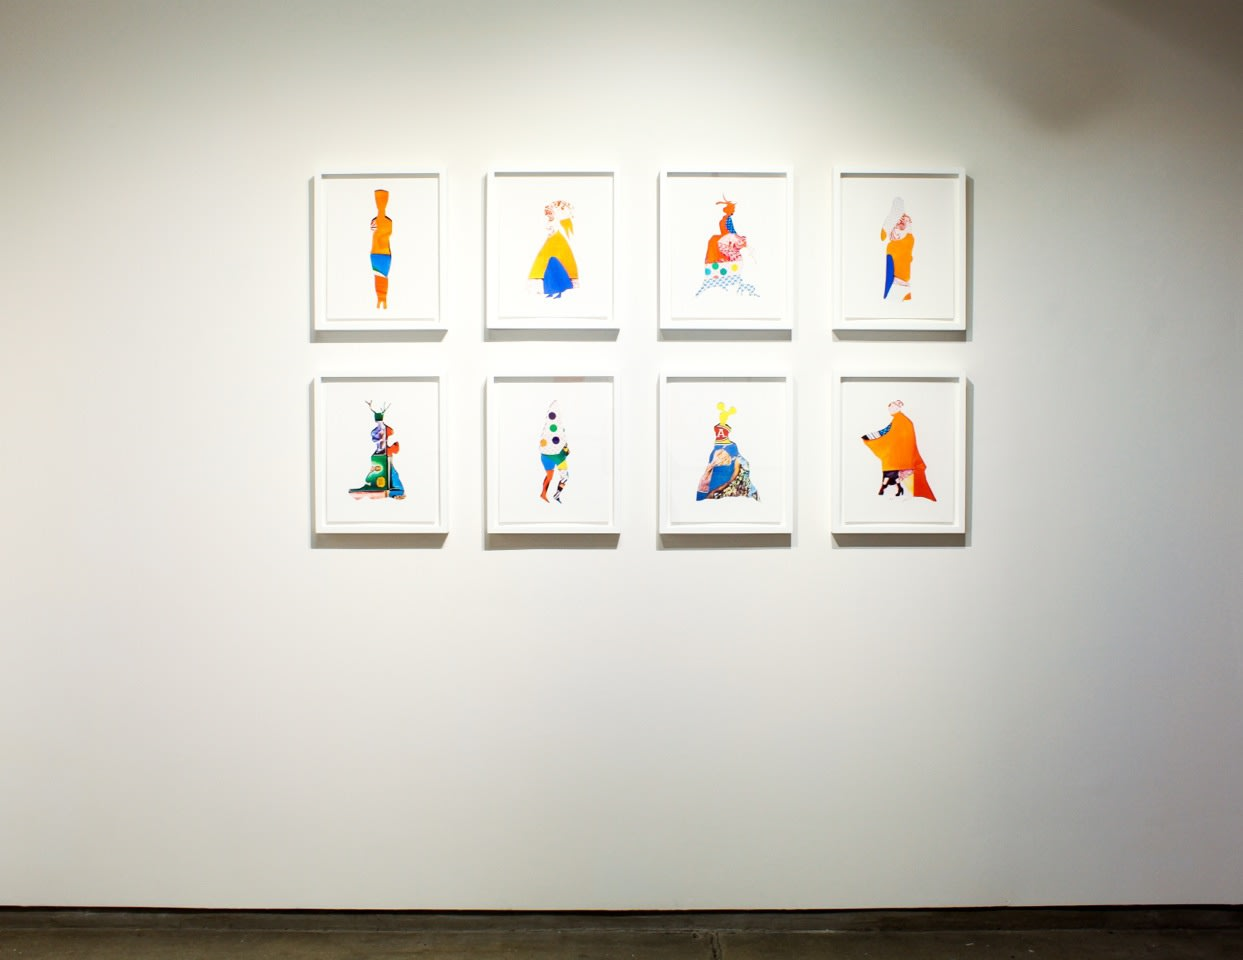 Bastienne Schmidt: Typology of Women